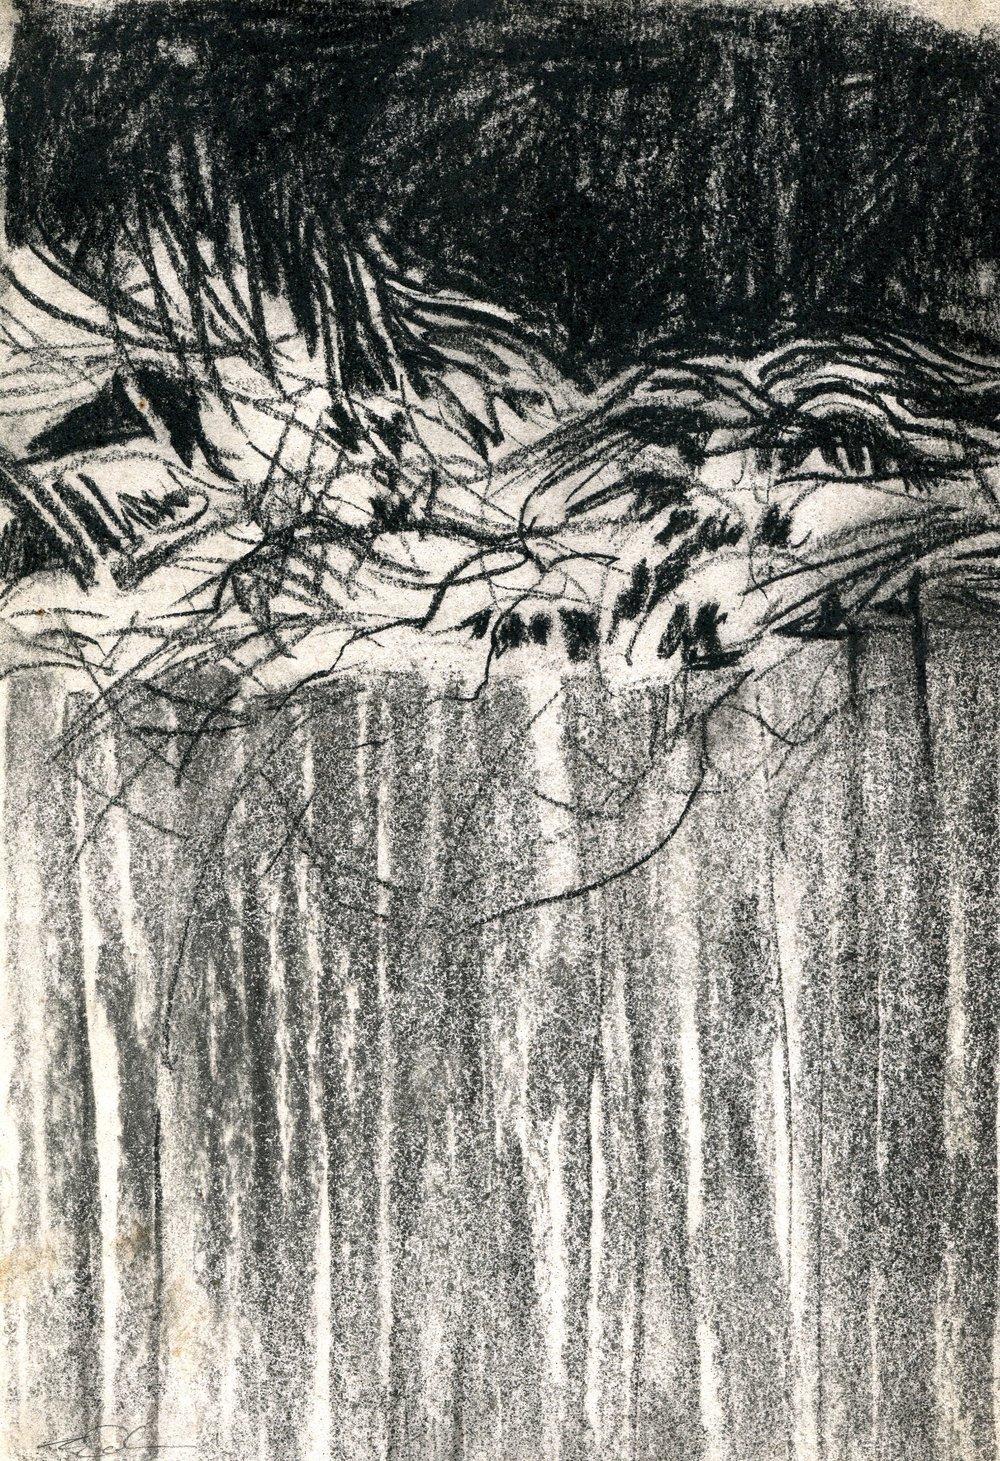 88b Saskia Osborne, Winter 2, Charcoal & conte on paper